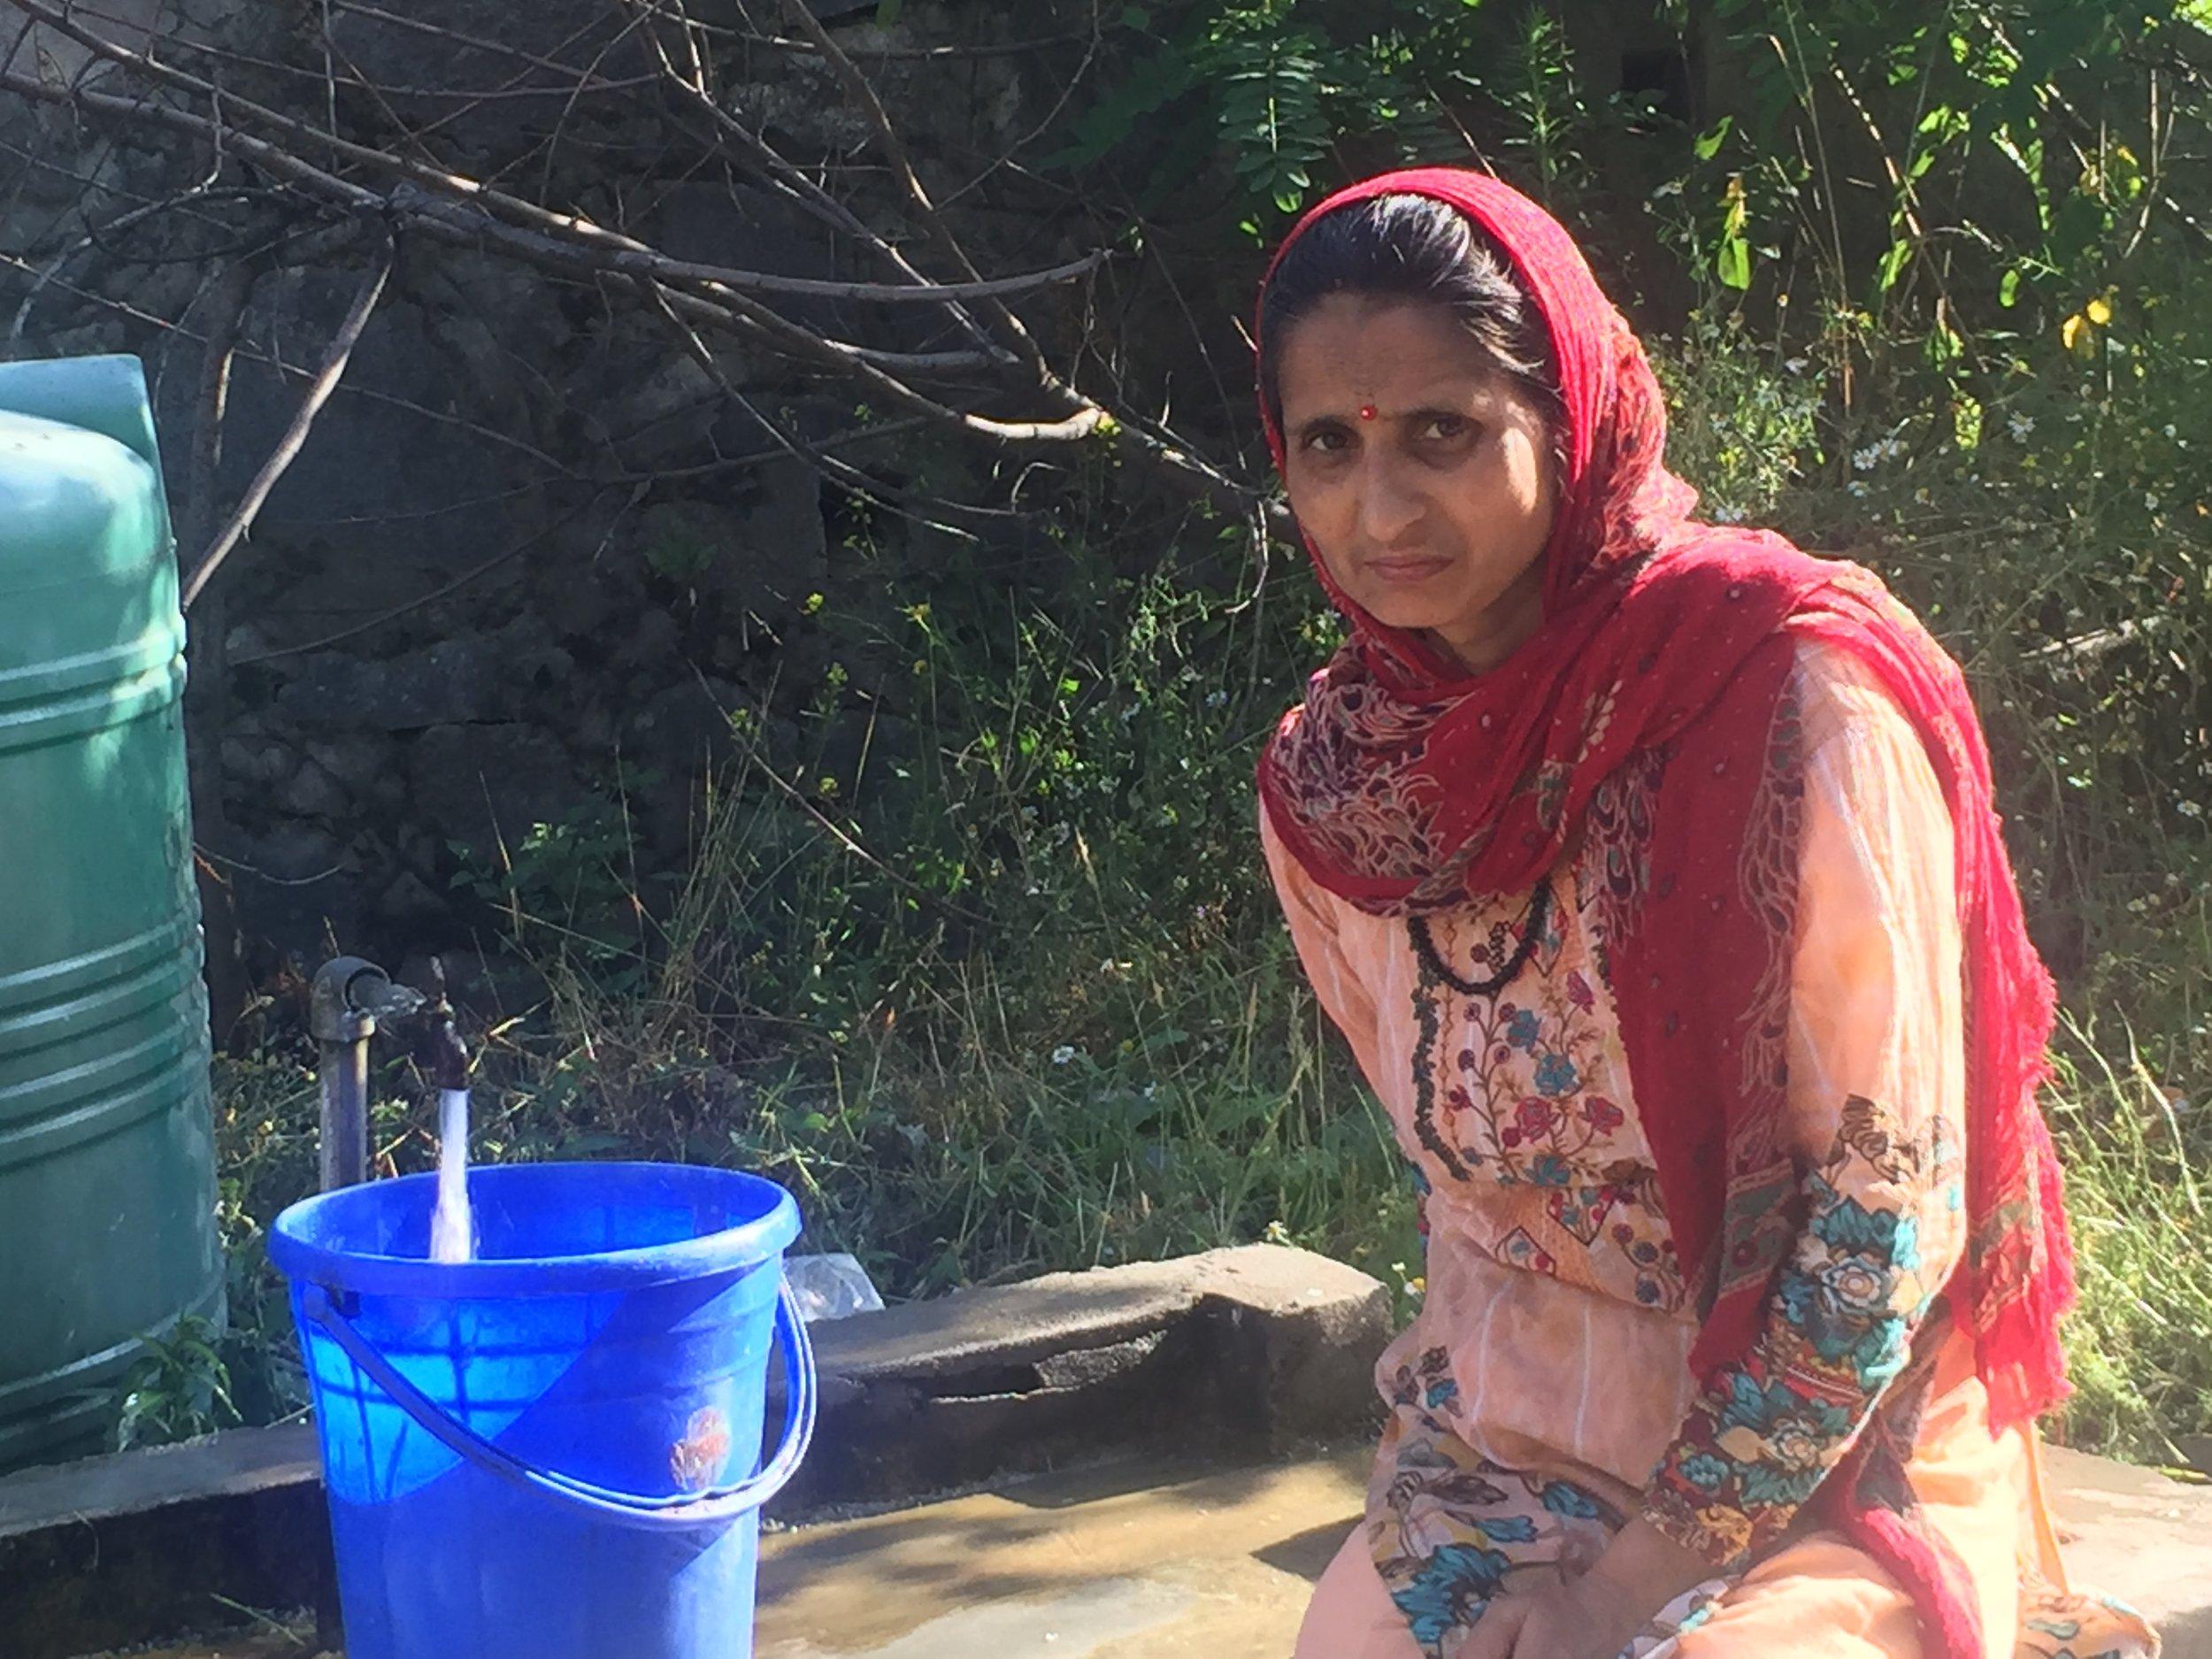 A Kashmiri Hindu woman collecting tap water in Kashmiri Pandit colony at Budgam, Kashmir. Photo by Taha Zahoor.